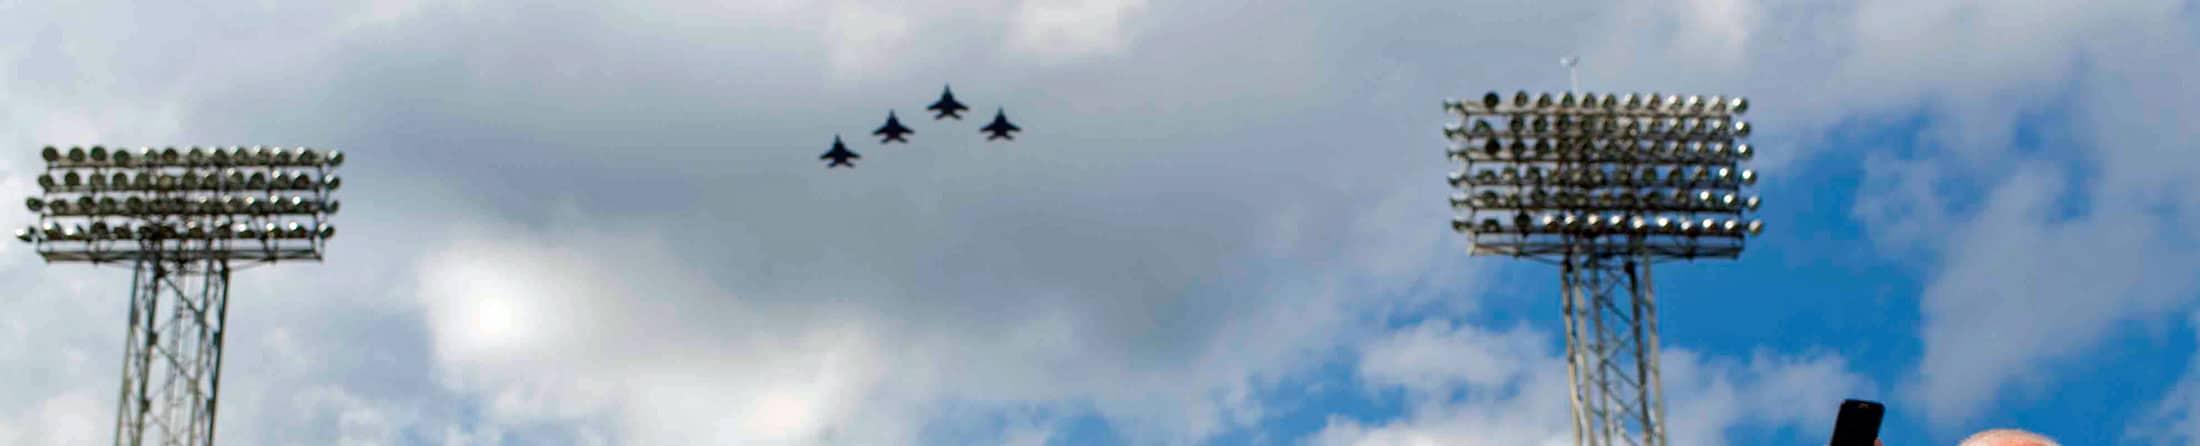 F-15 Flyover at Fenway Park in Boston